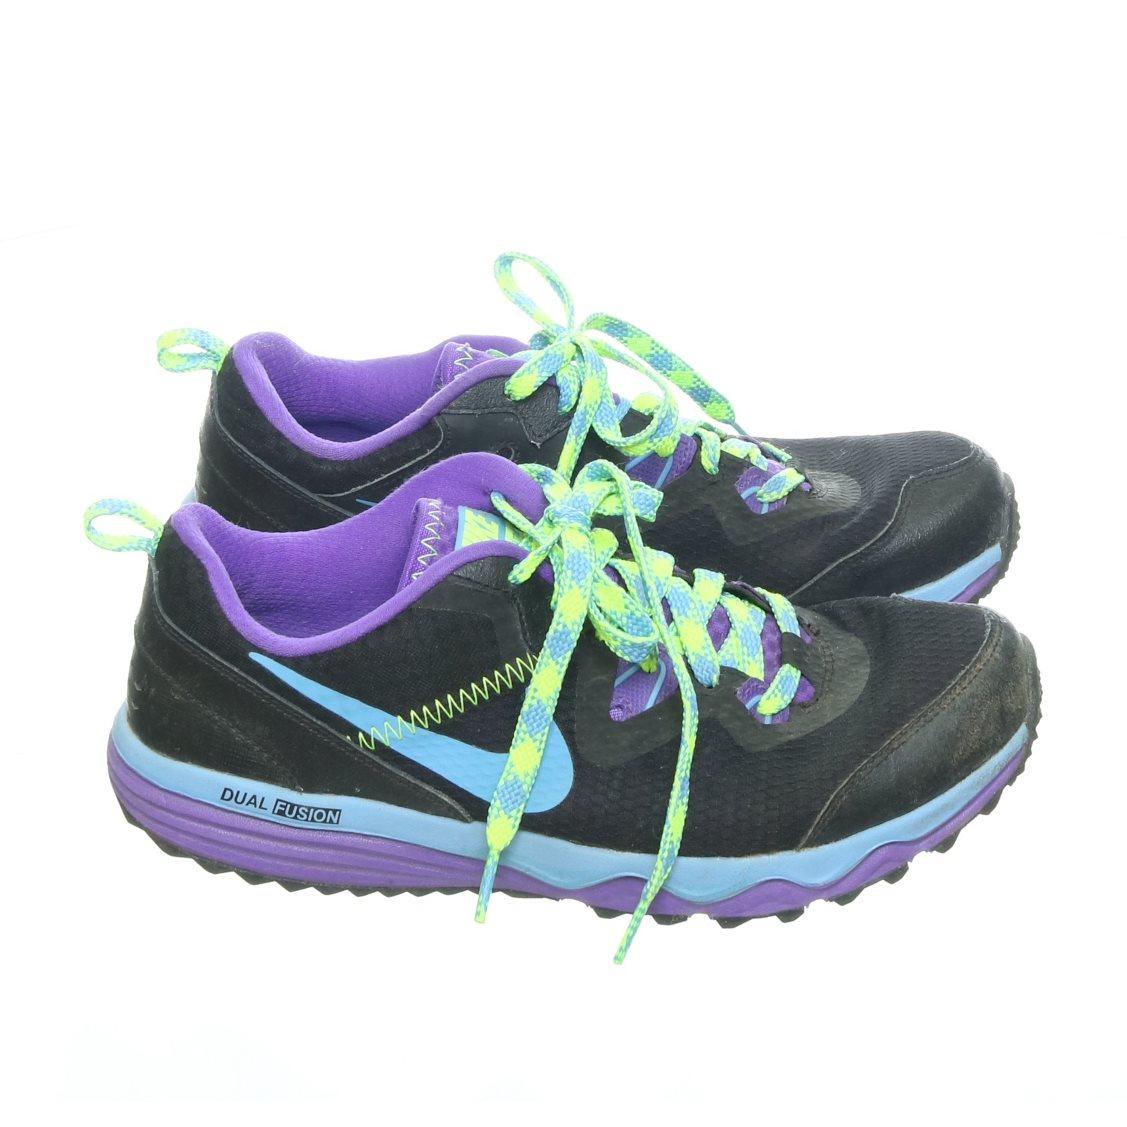 reputable site e4eb6 ac14a Nike, Träningsskor, Strl  38,5, Dual fusion, Svart Lila